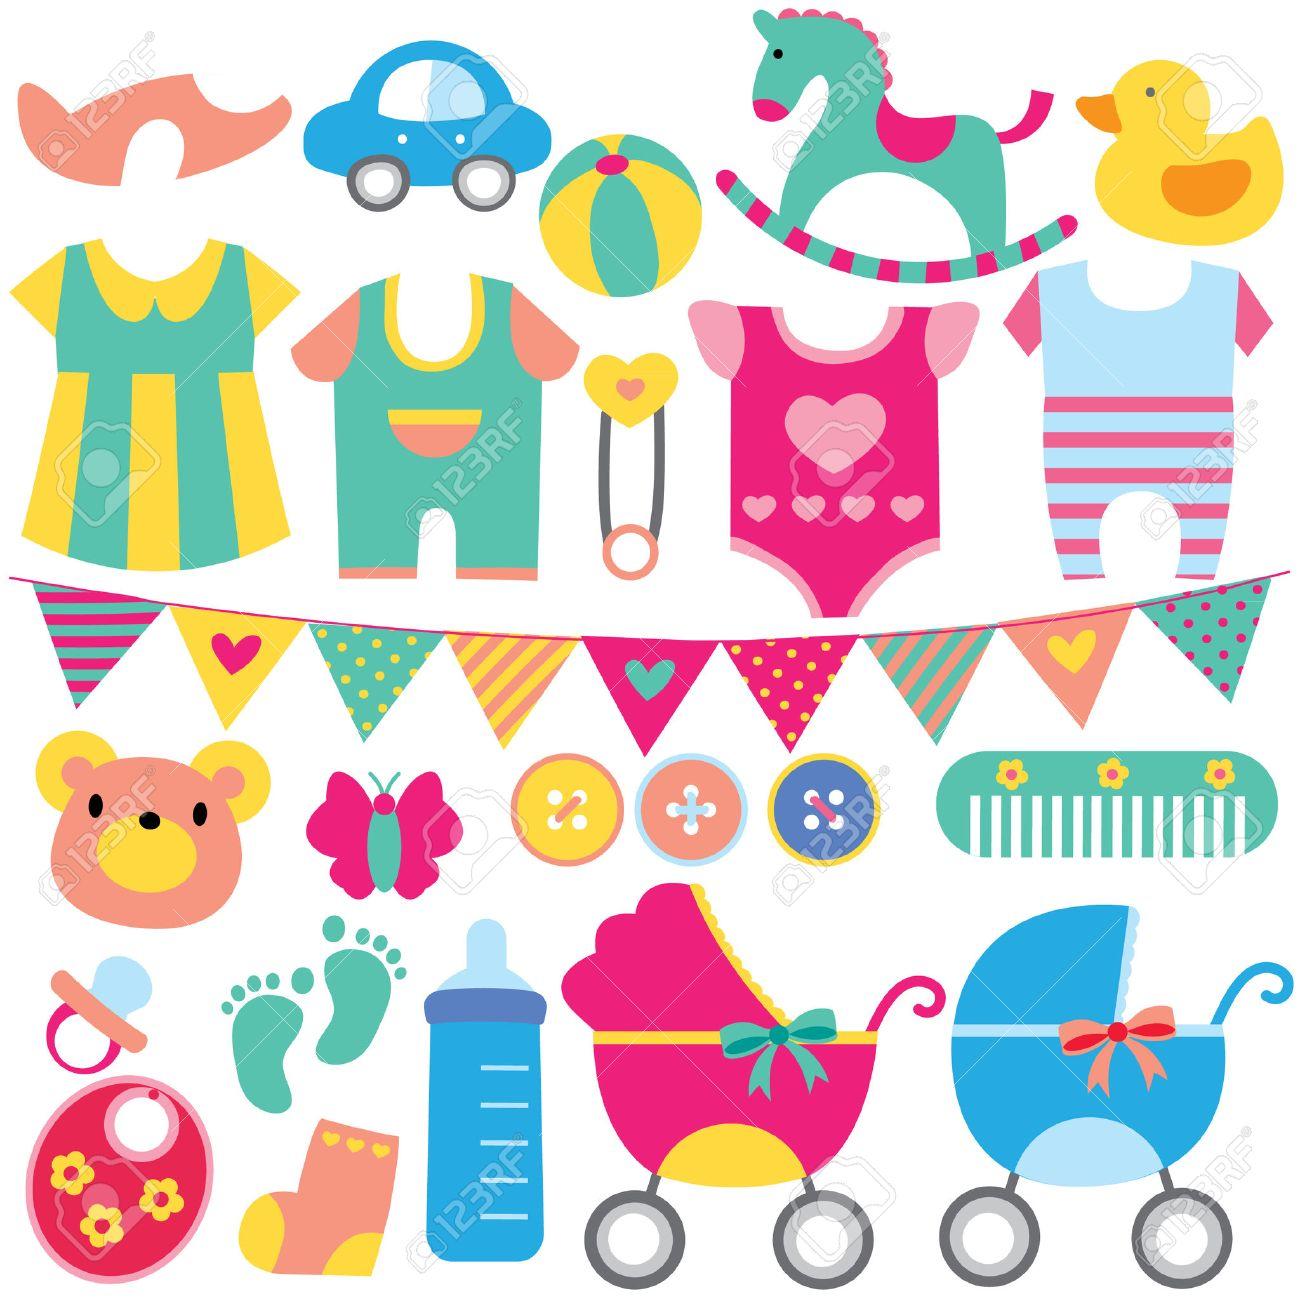 baby objects clip art set.